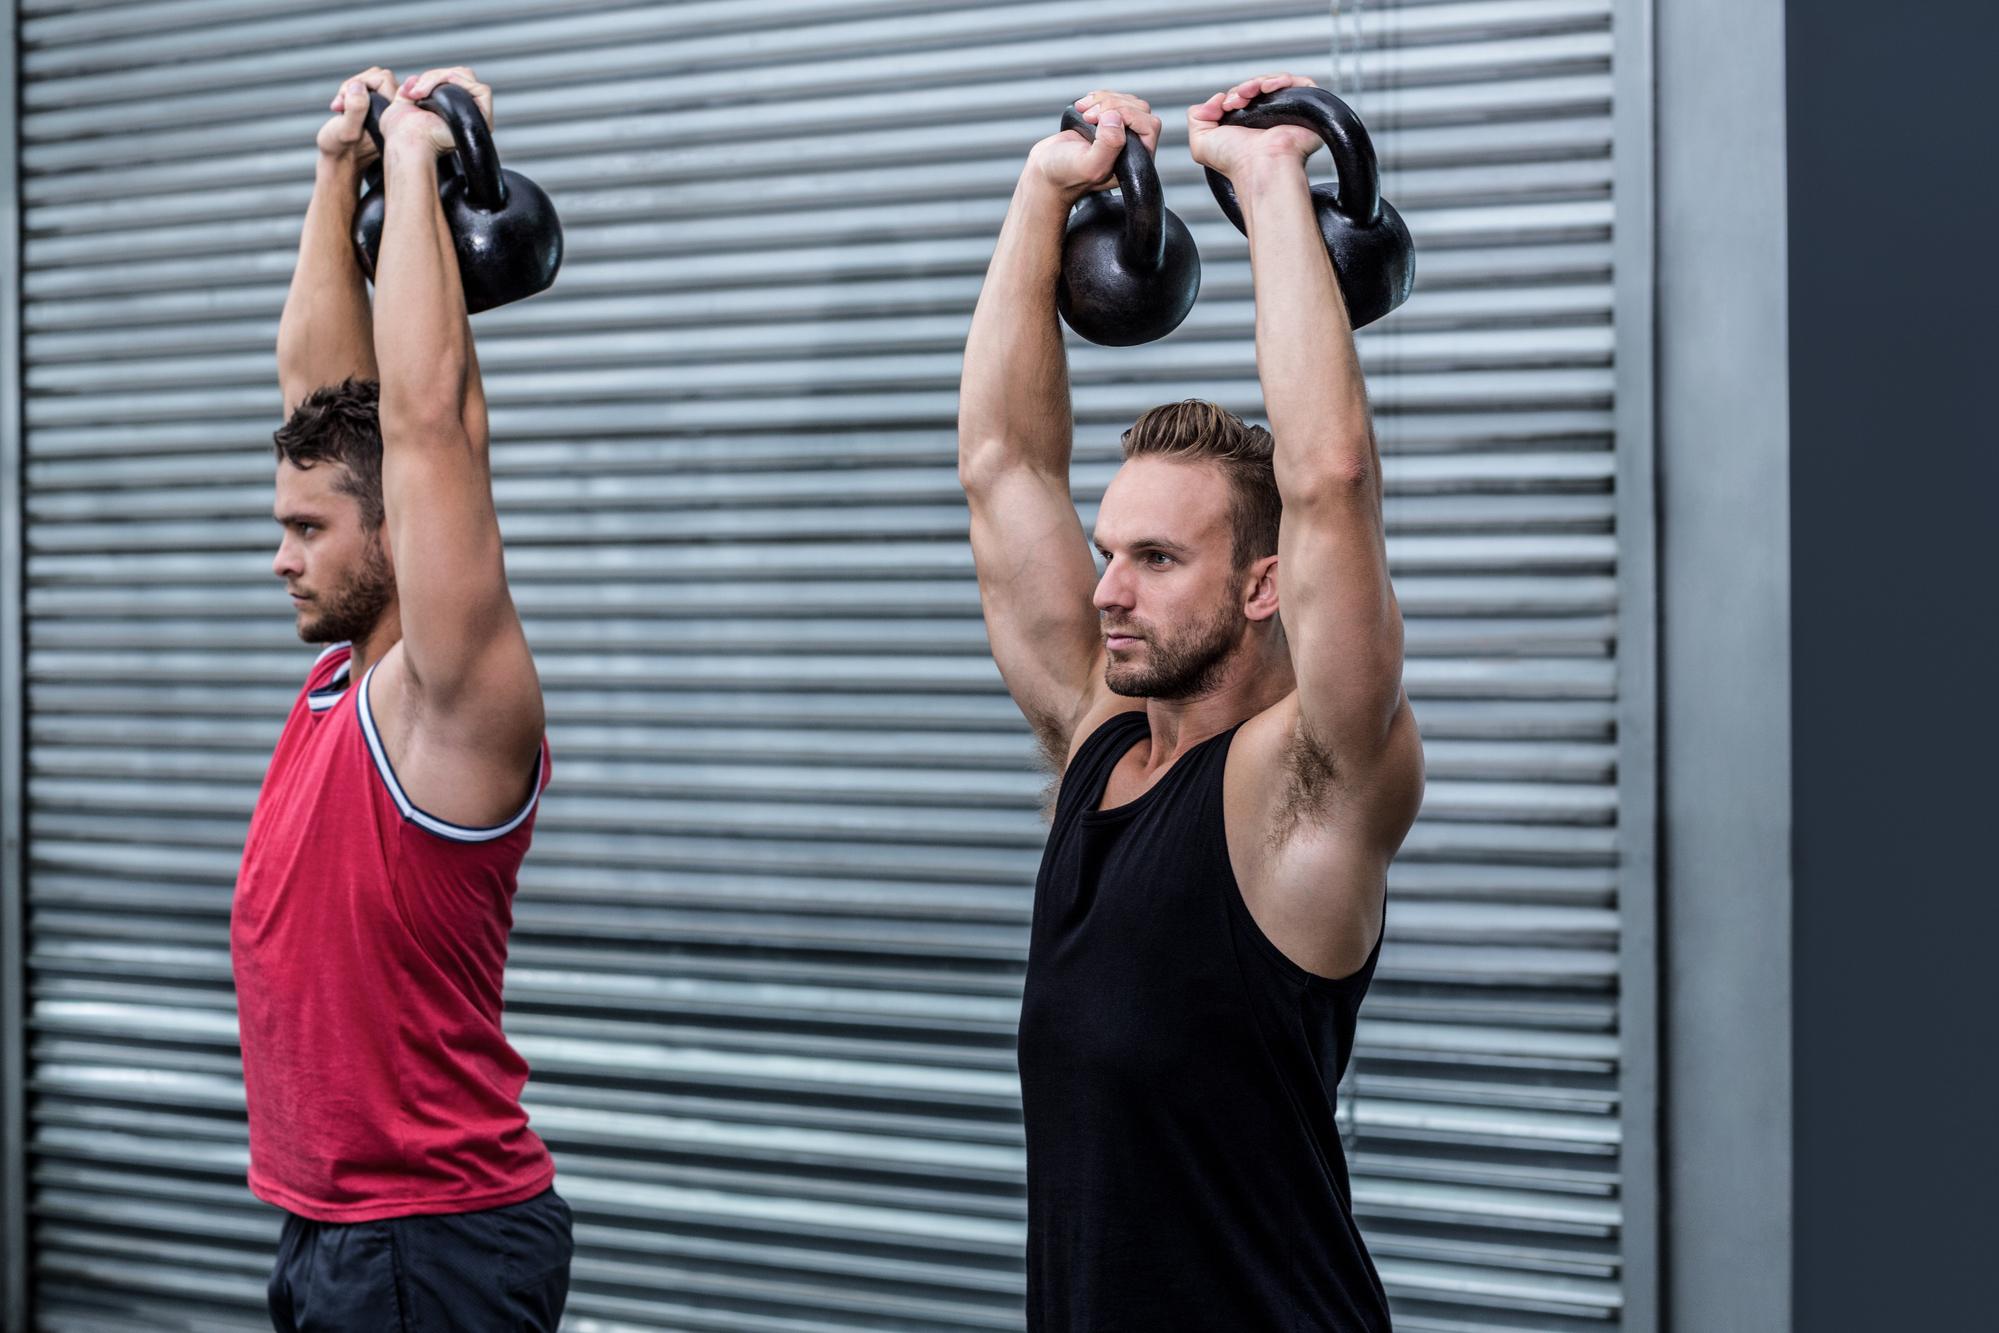 Two muscular men lifting a kettle bell